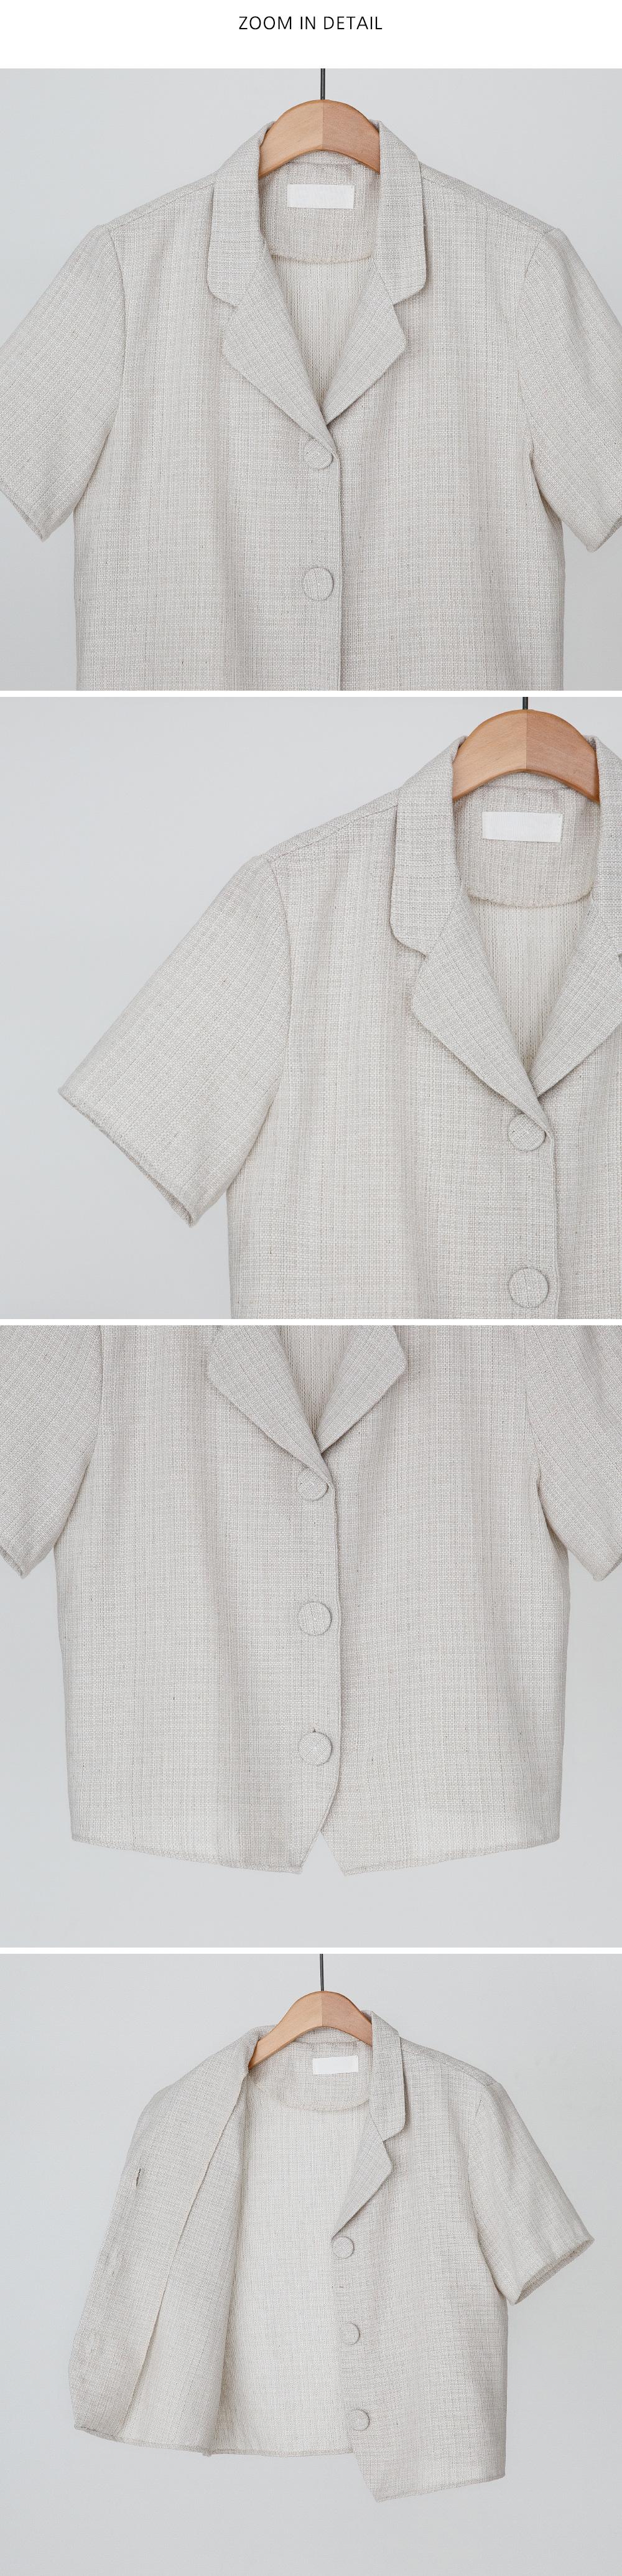 Open collar neck short sleeve blouse jacket